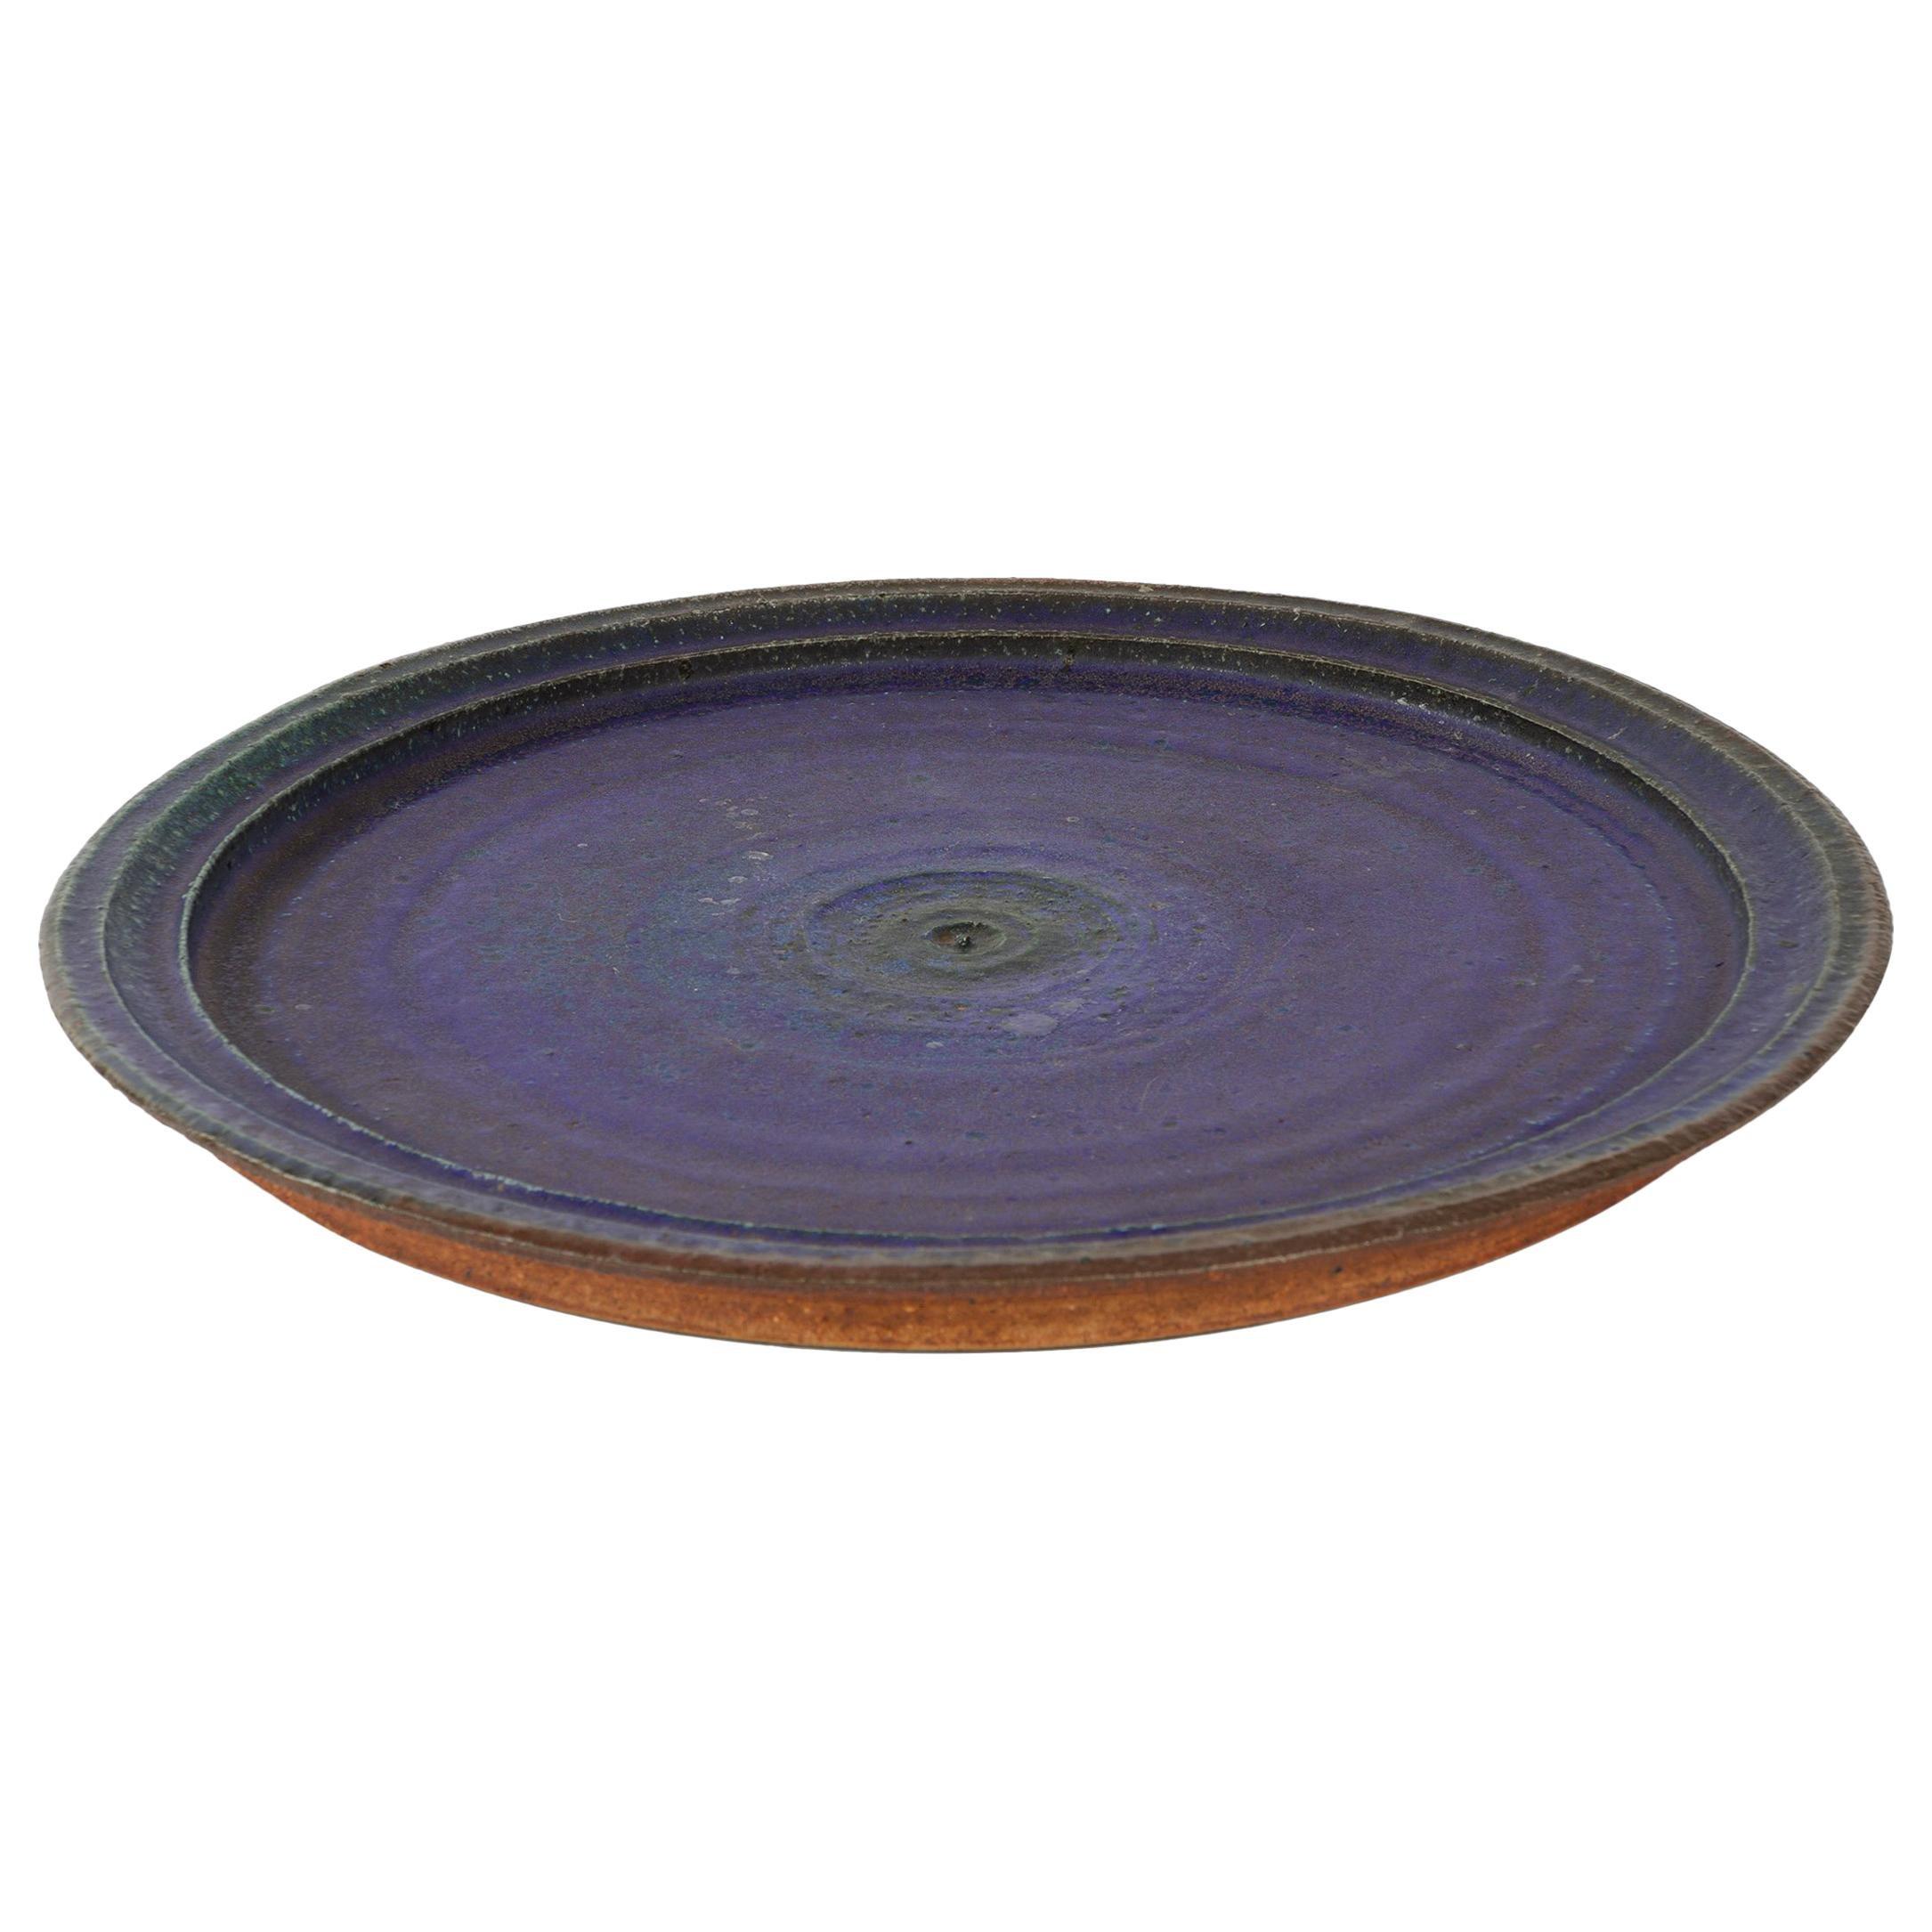 Ceramic Platter by Raija Tuumi for Arabia, Finland